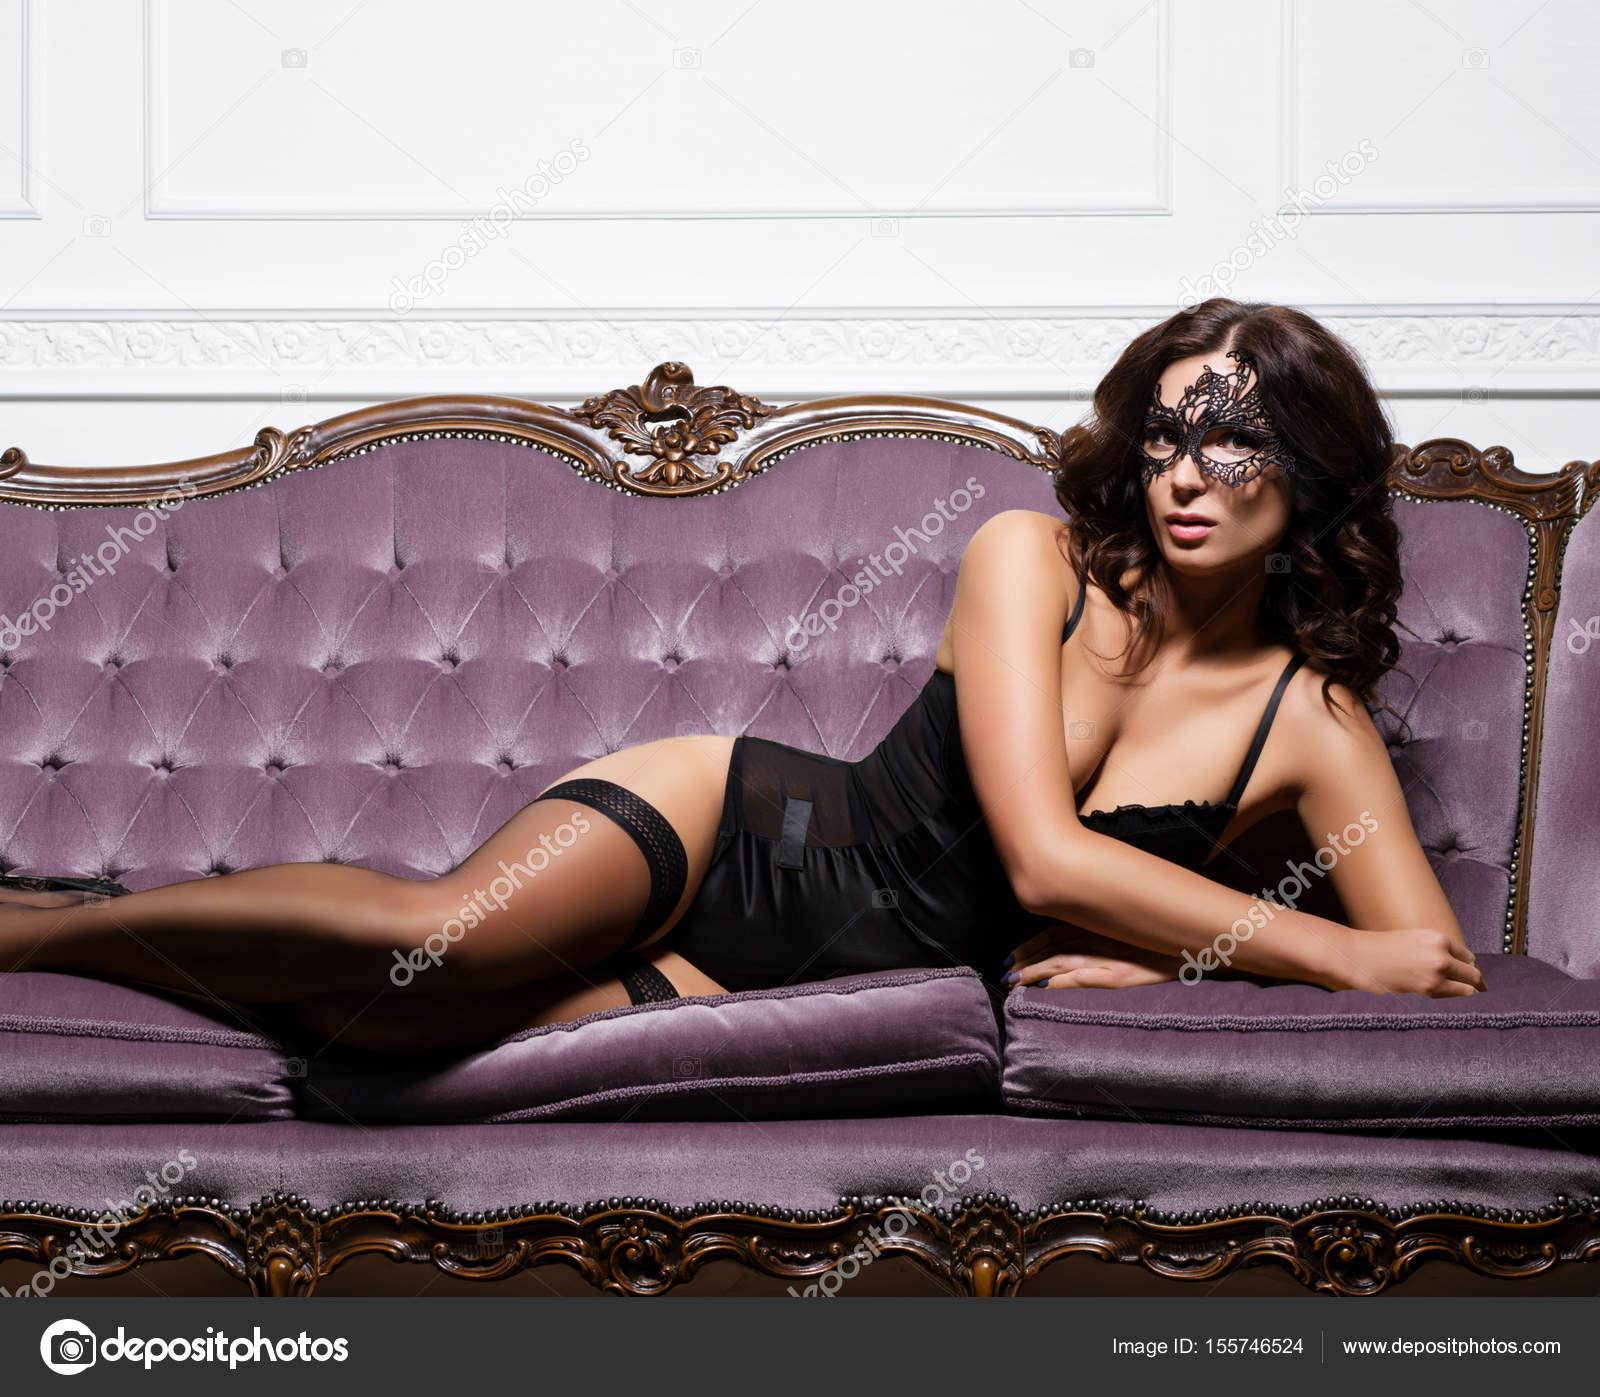 4a6c033f5bd όμορφη γυναίκα με δαντέλα μάσκα — Φωτογραφία Αρχείου © shmeljov ...